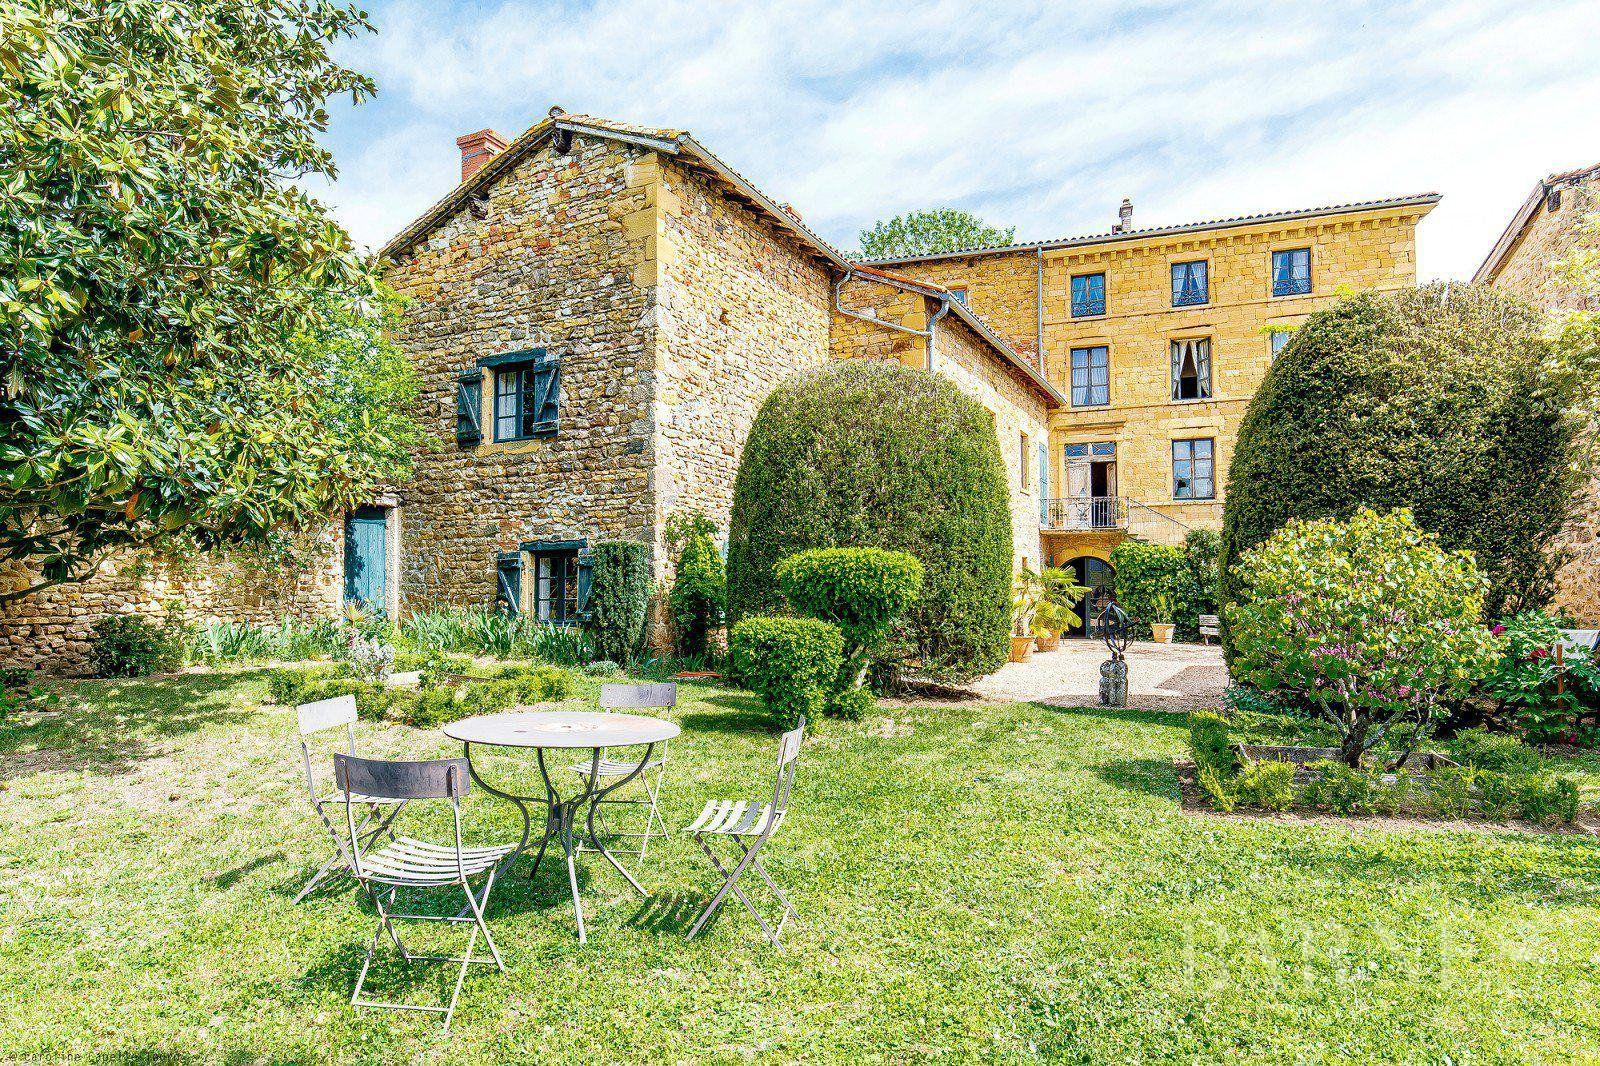 Légny - Le Bois-d'Oingt - 300 sqm house with character - 1128 sqm plot - 4 bedrooms